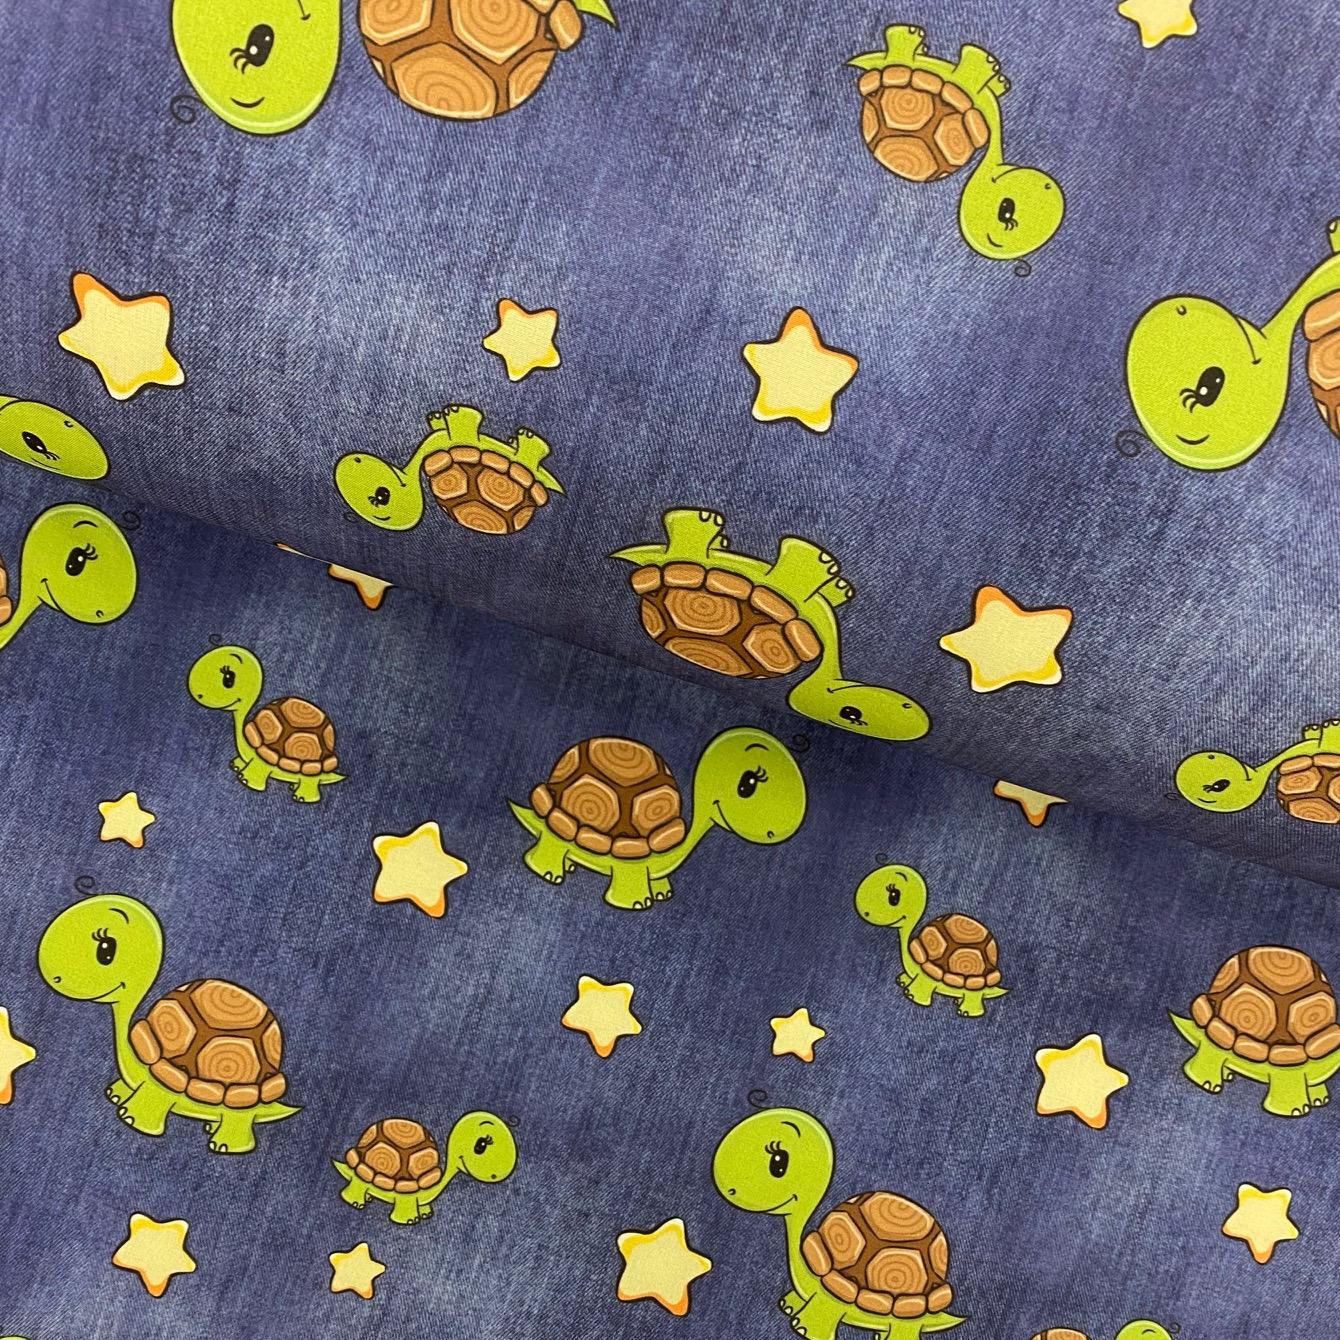 Softshell Digitaldruck, Schildkröten. Art. 7211.008